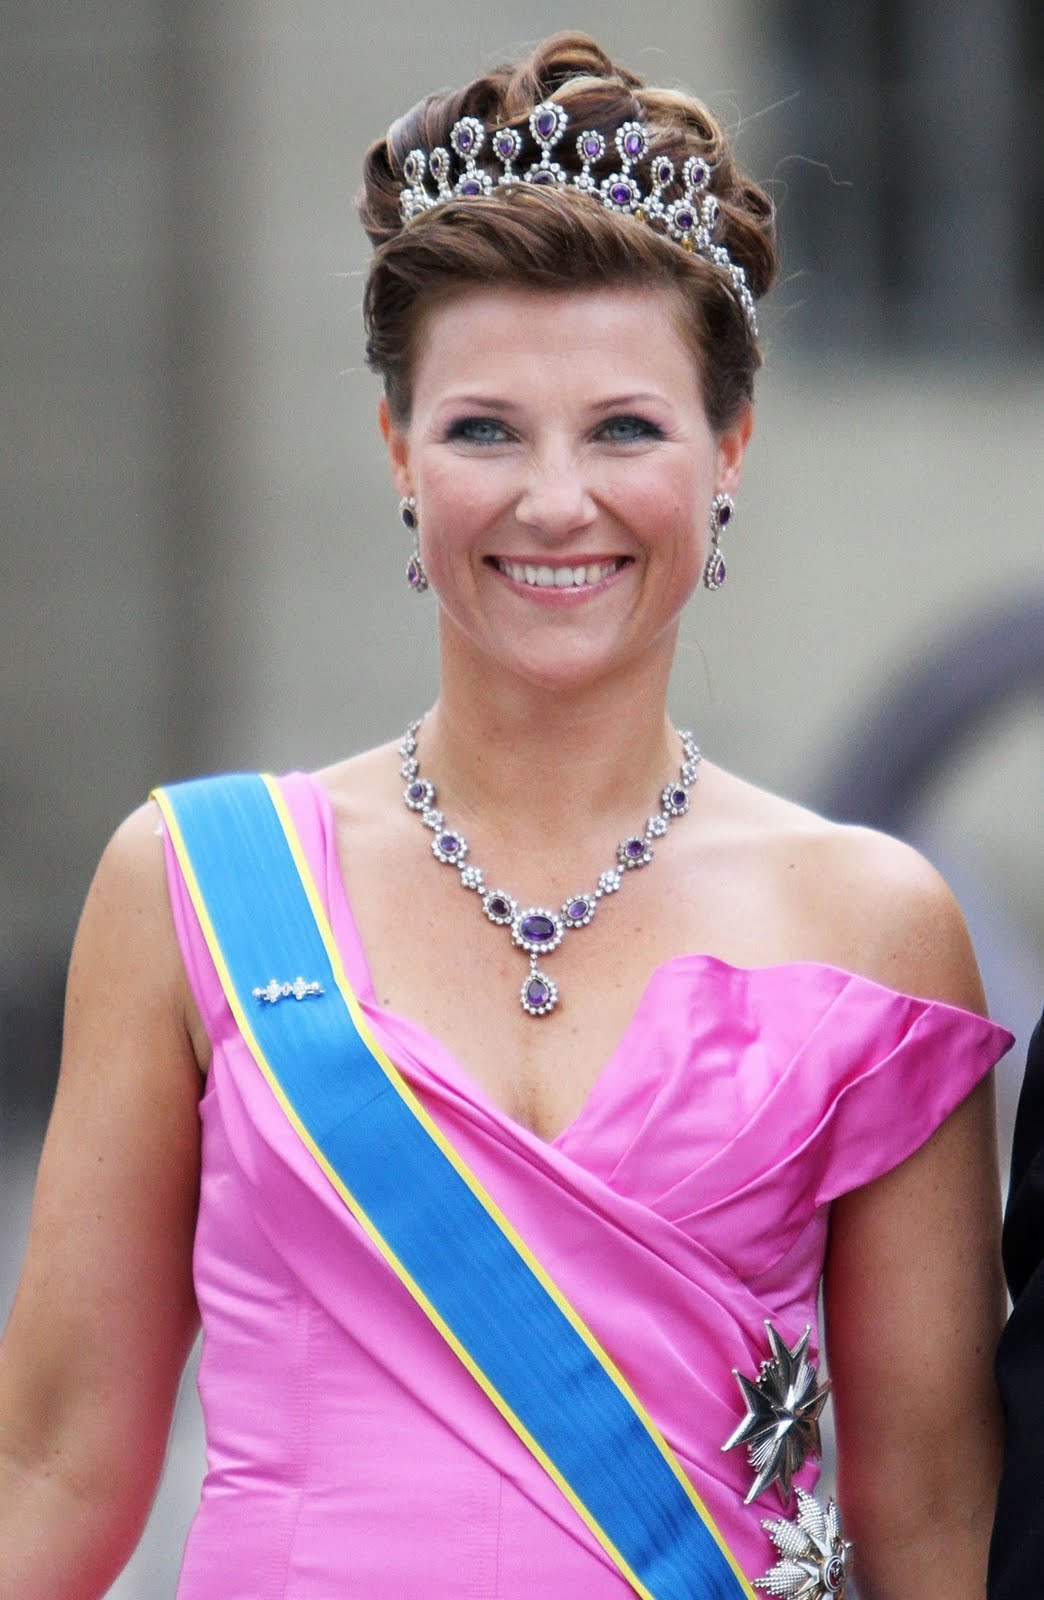 Marie Poutine S Jewels Amp Royals Norwegian Royals